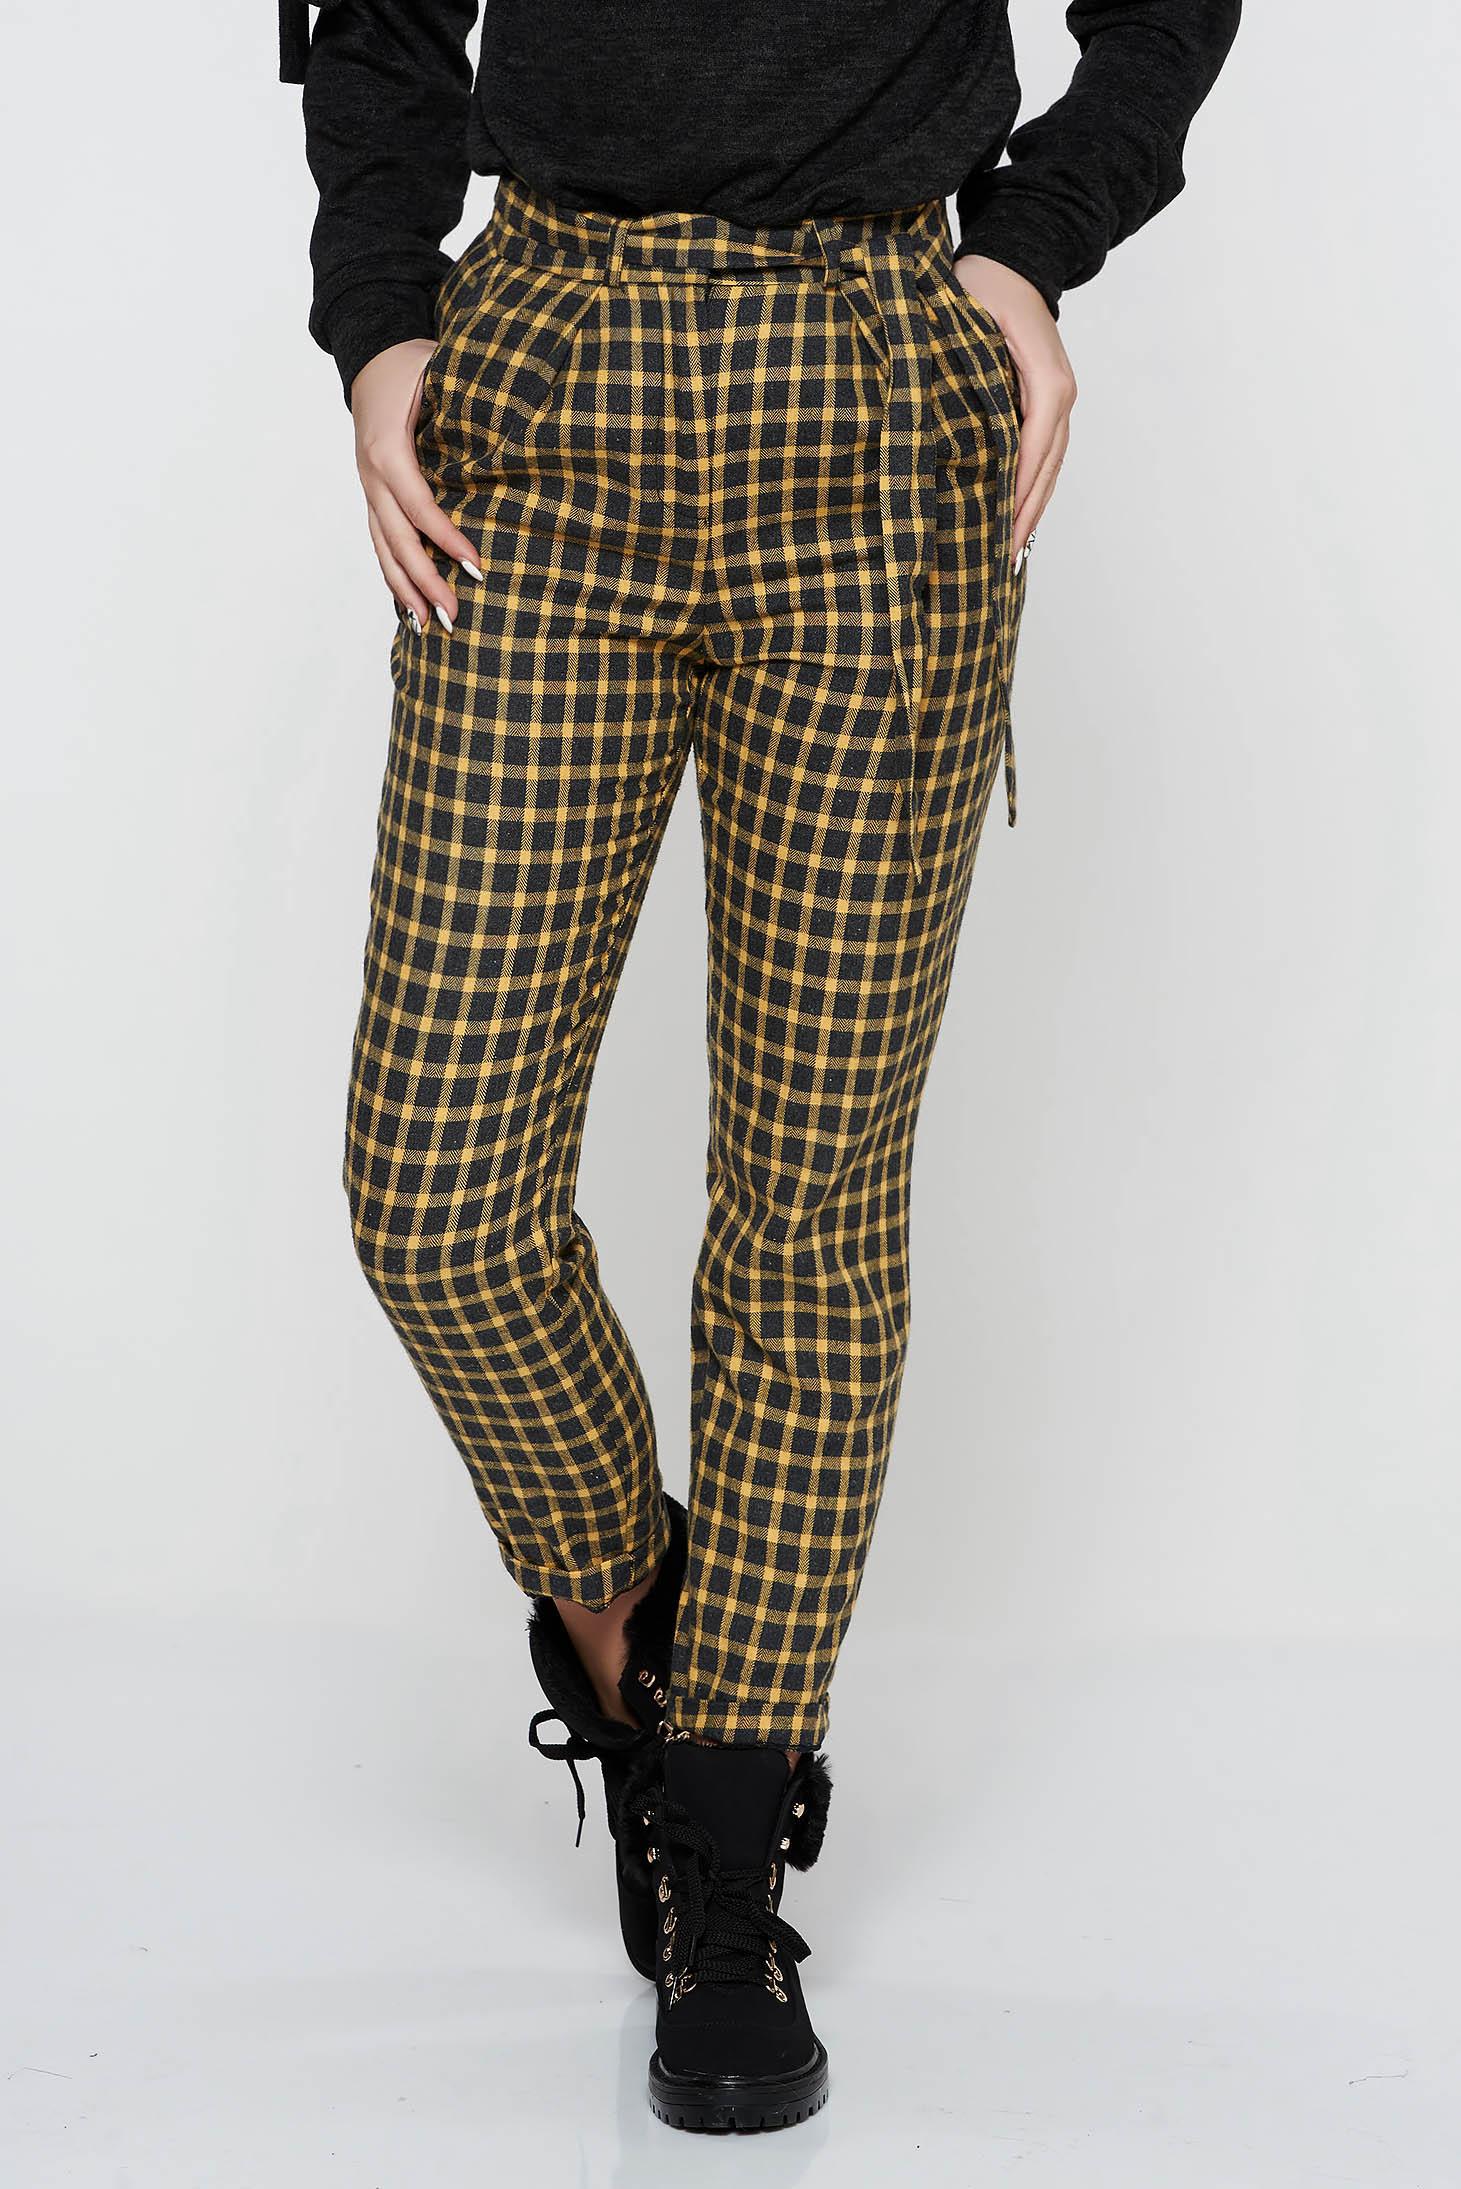 Pantaloni StarShinerS mustarii casual conici cu talie inalta din stofa neelastica cu buzunare accesorizati cu cordon